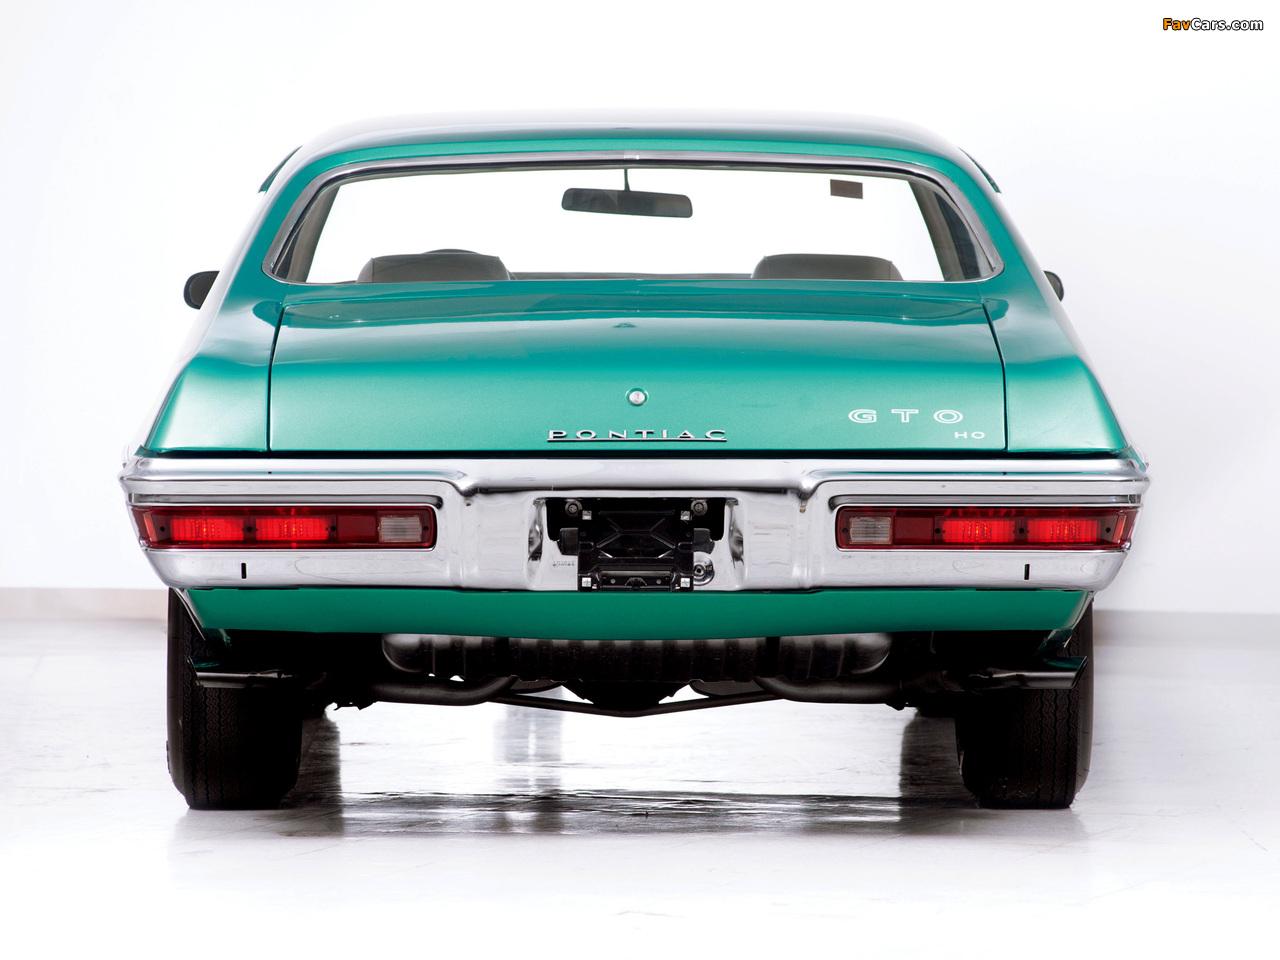 Pontiac GTO Coupe 1972 photos (1280 x 960)